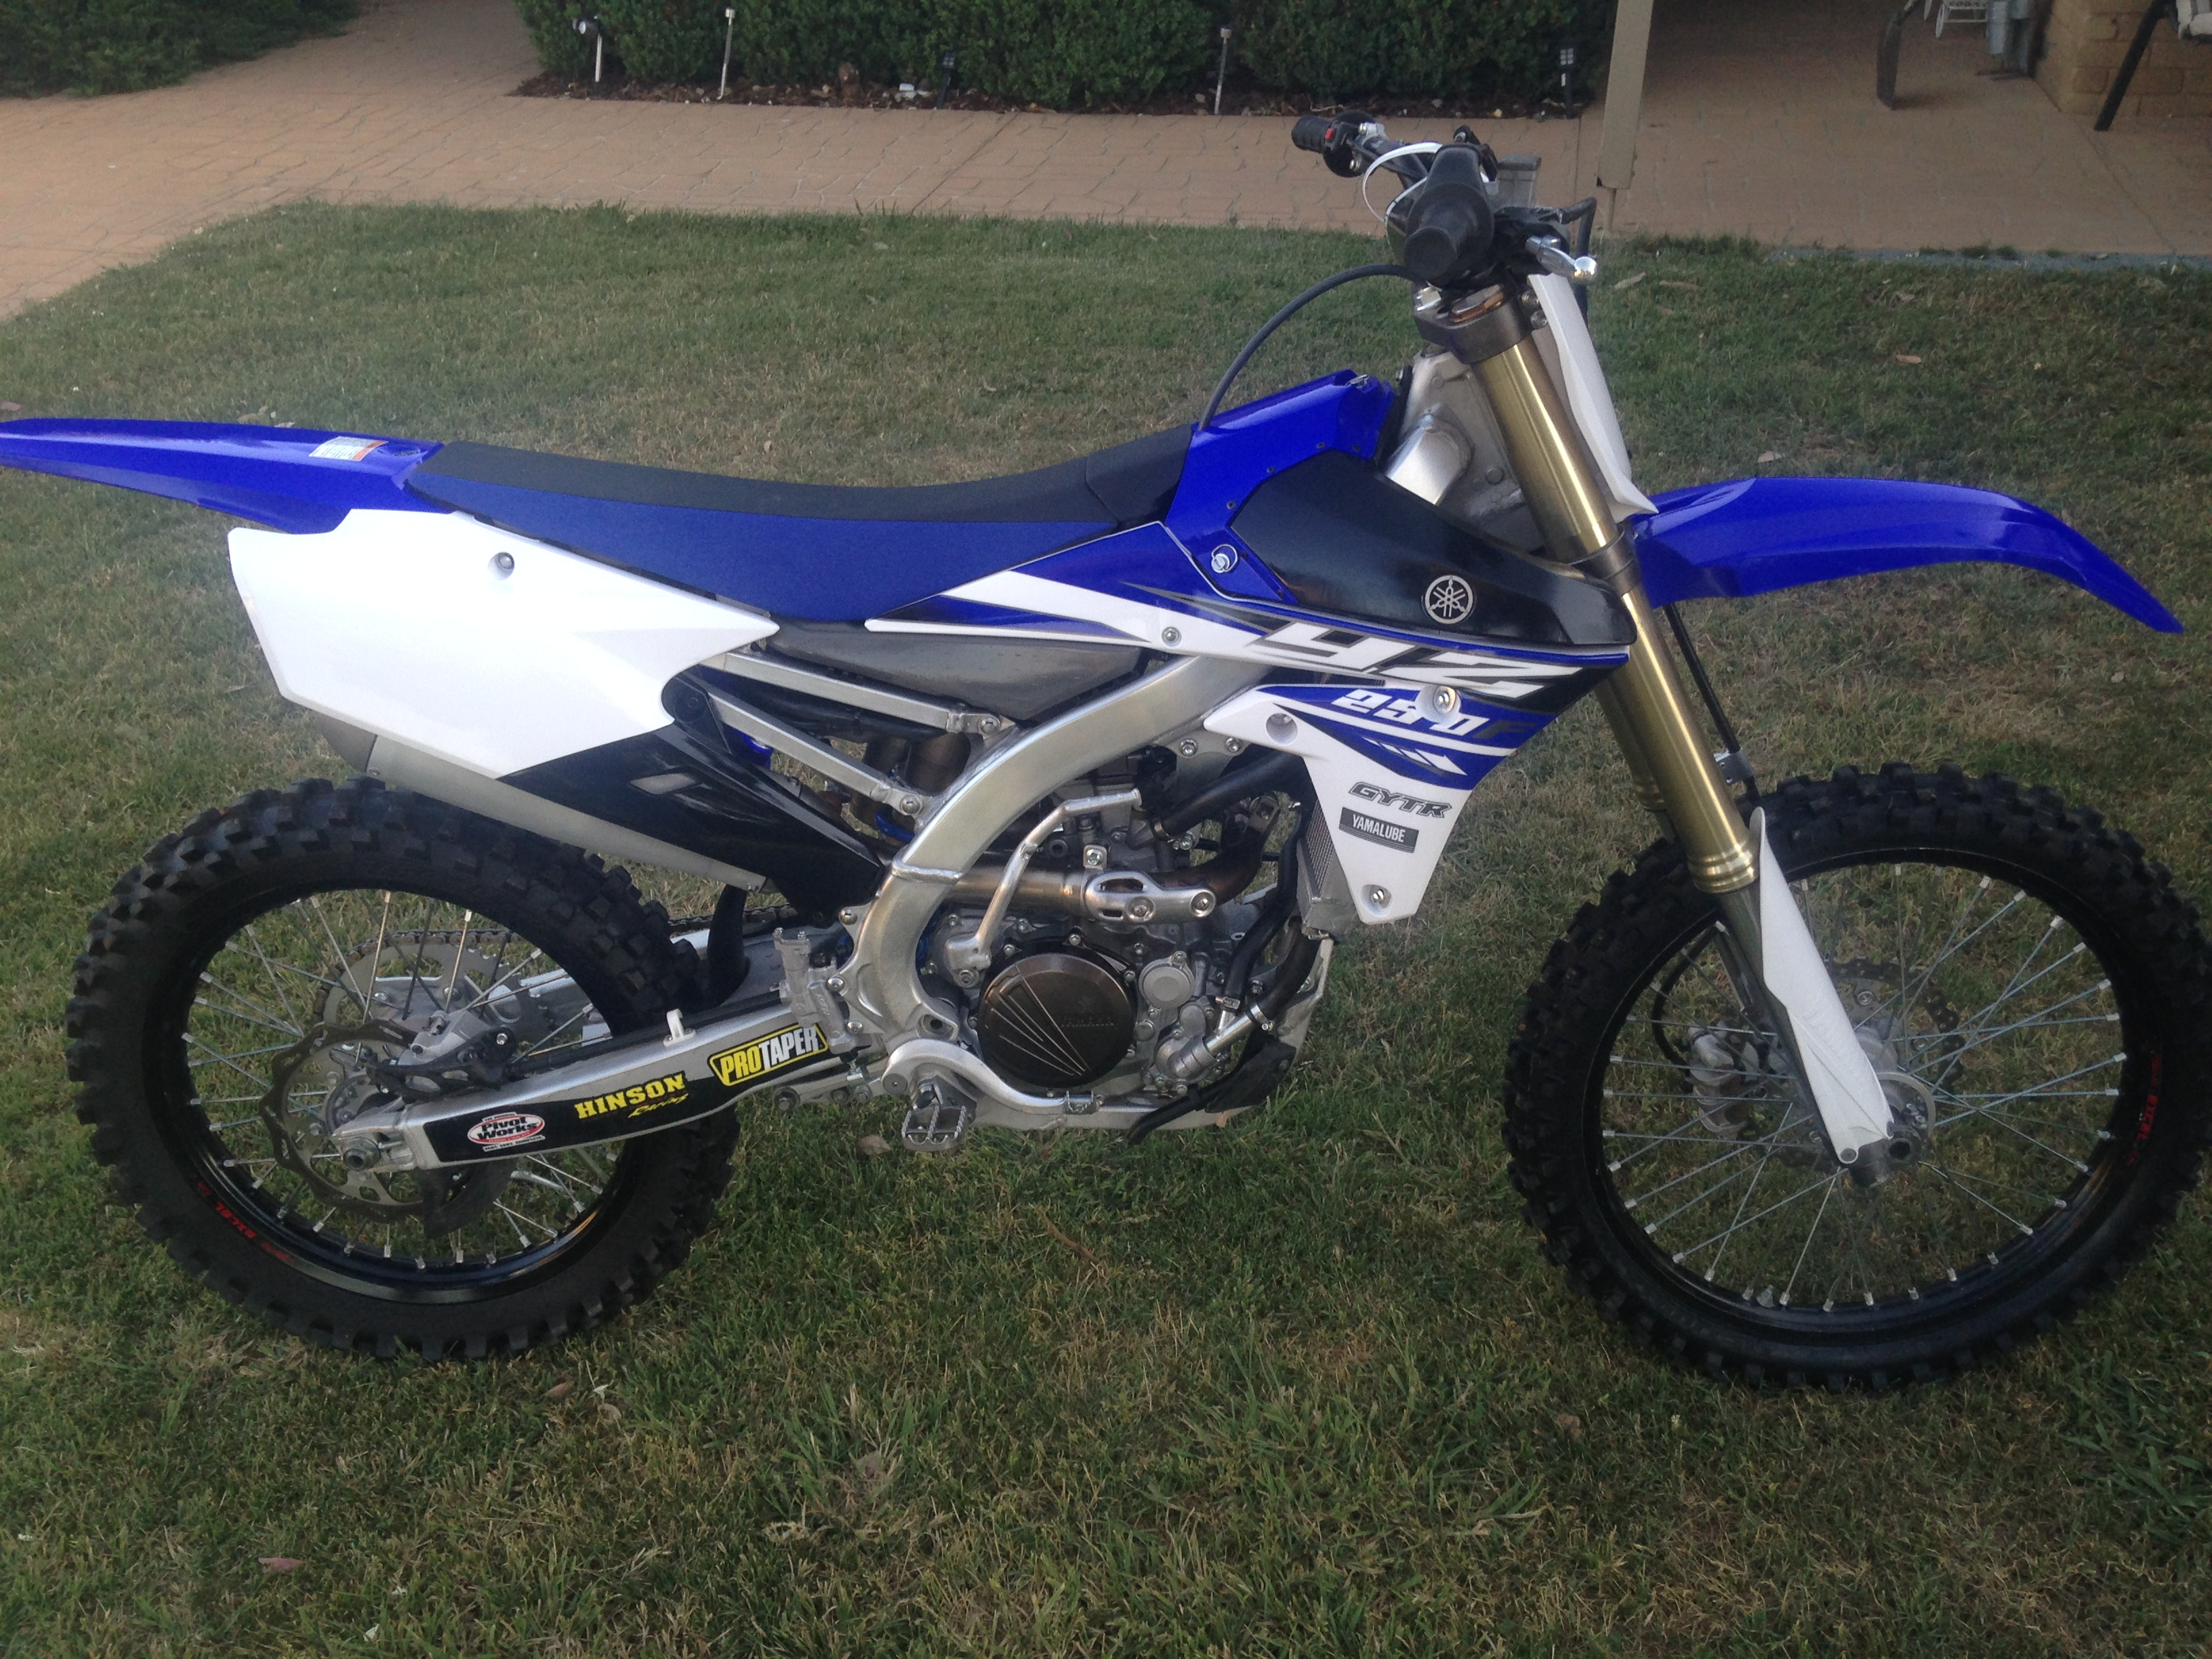 2015 yamaha yz250f bike sales vic north east 2919128 for Yamaha yz250f for sale